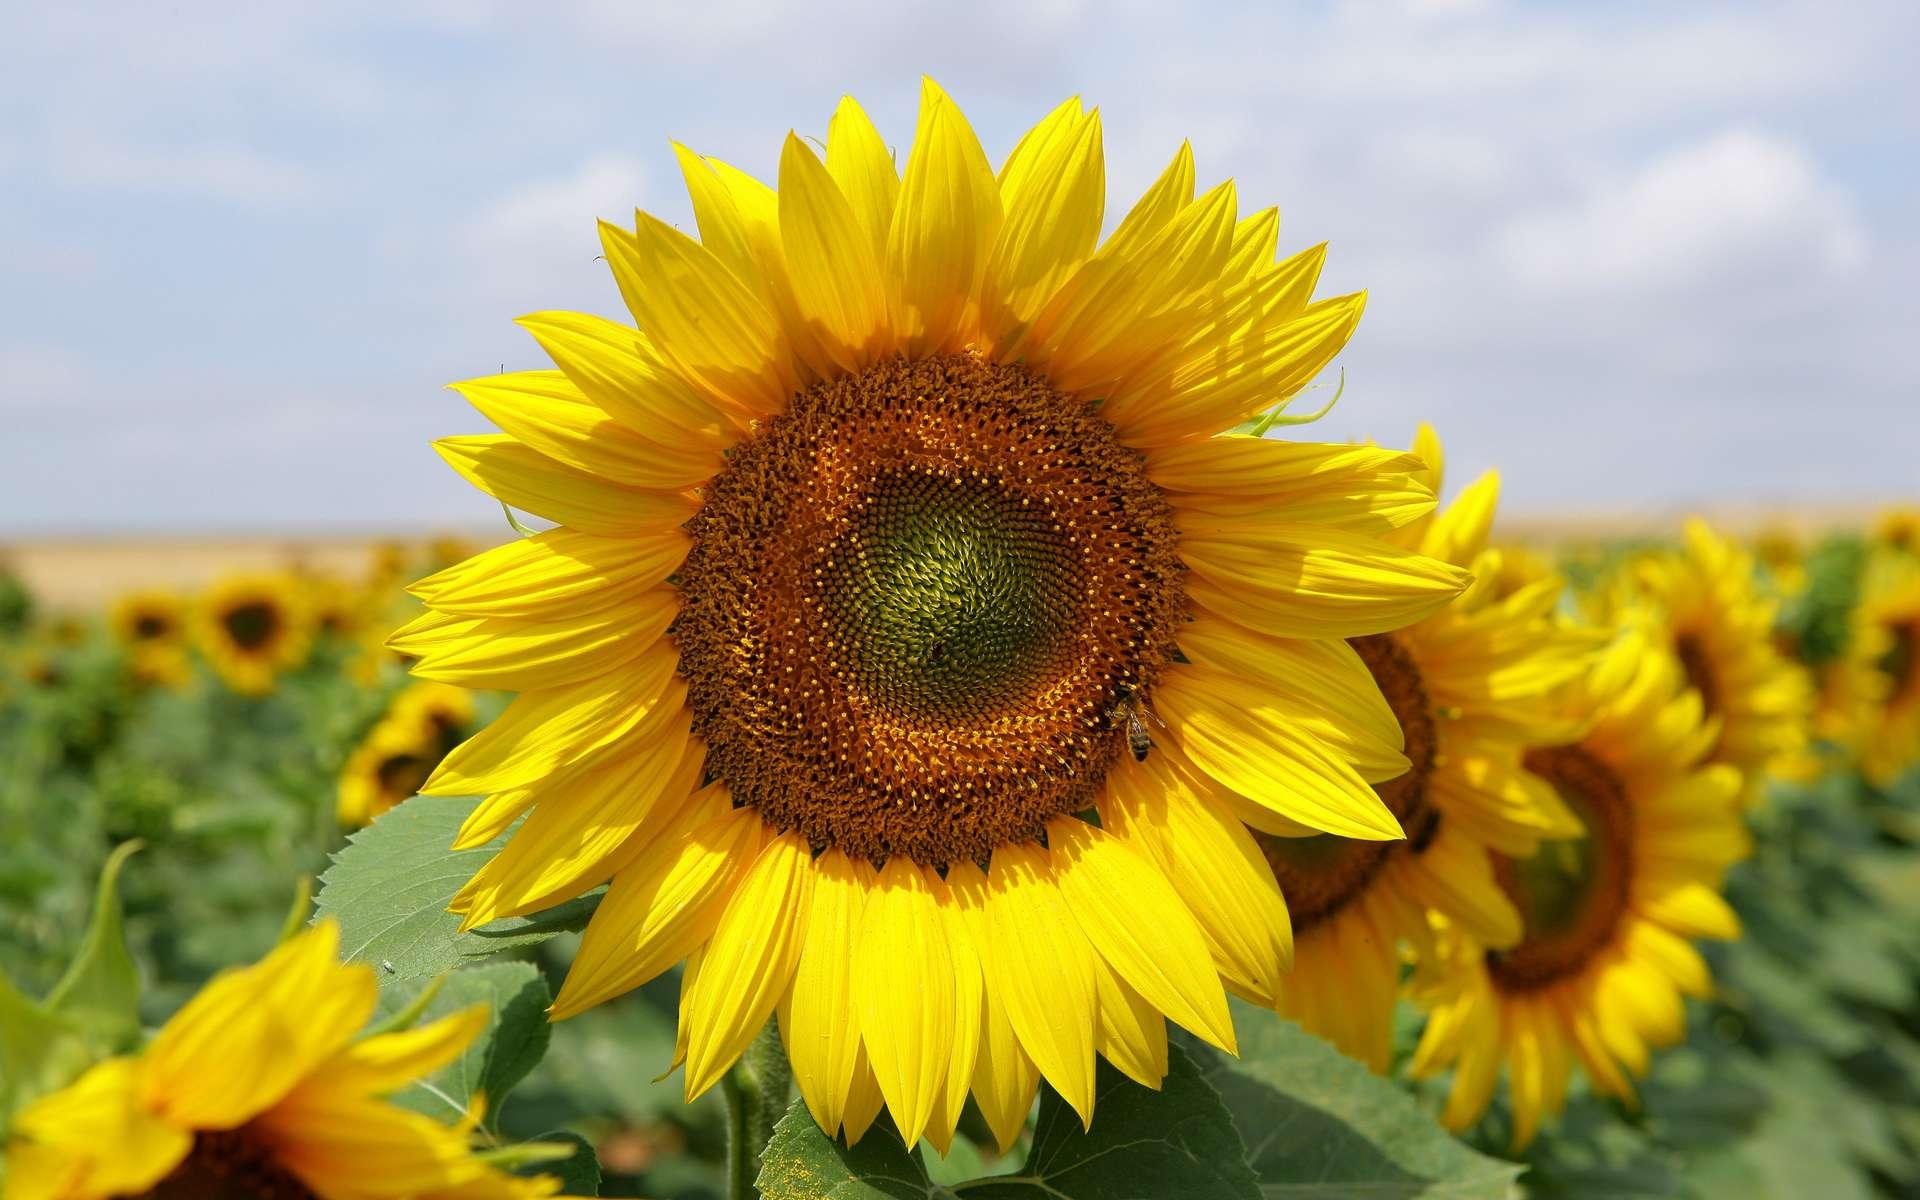 Gambar Bunga Matahari Mawar